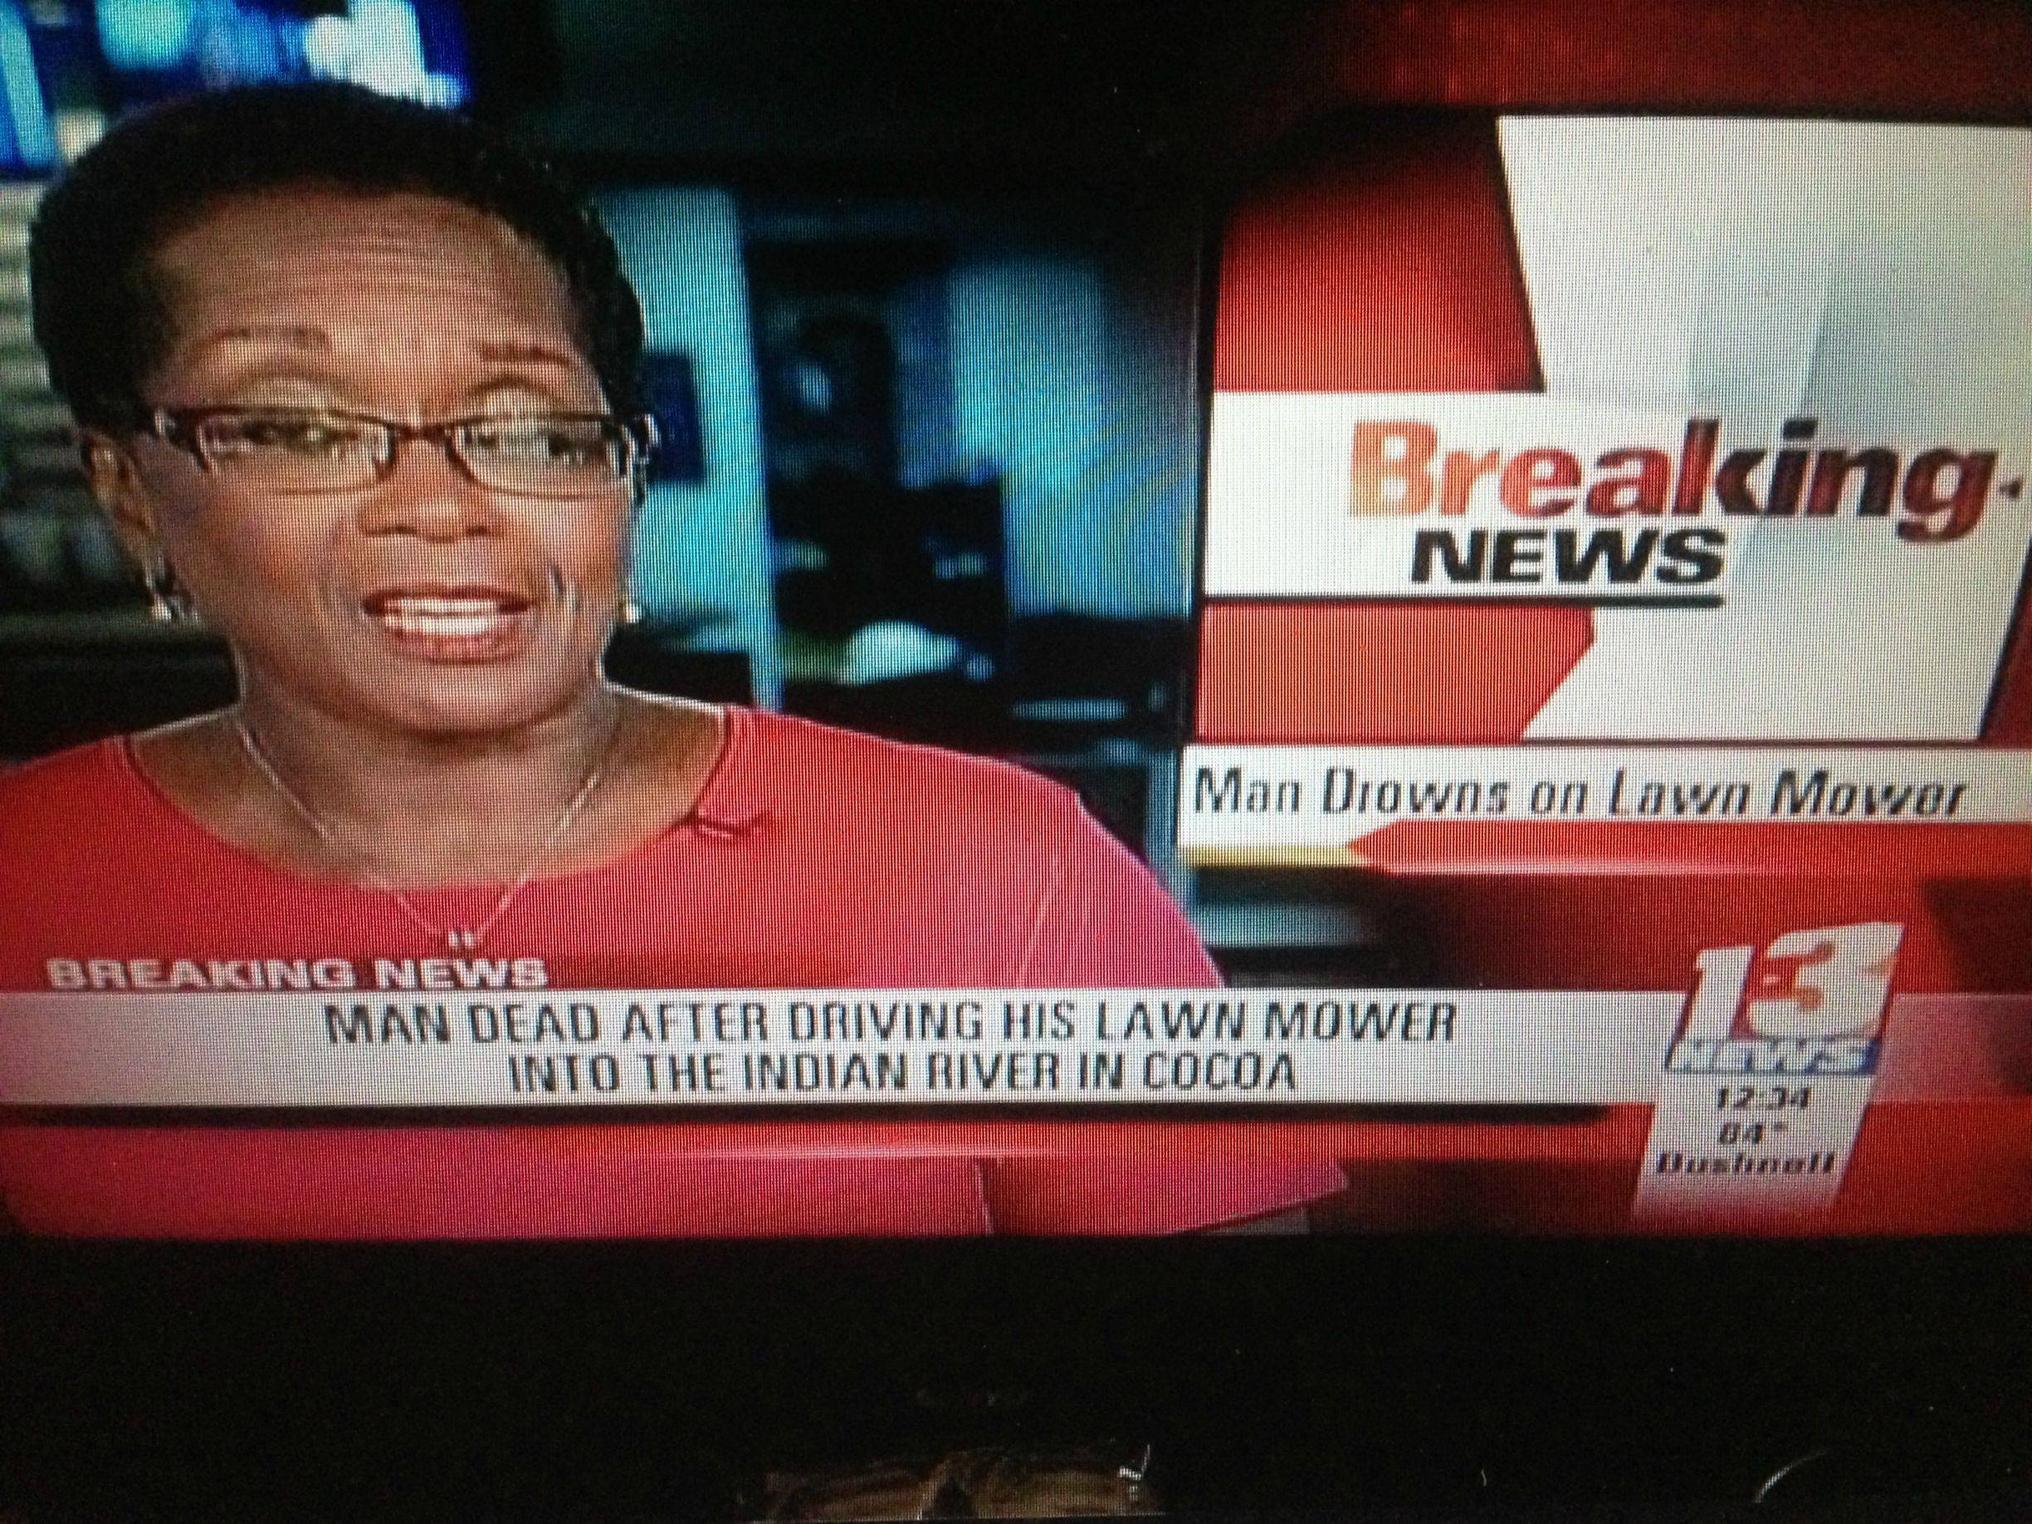 lawnmower drown